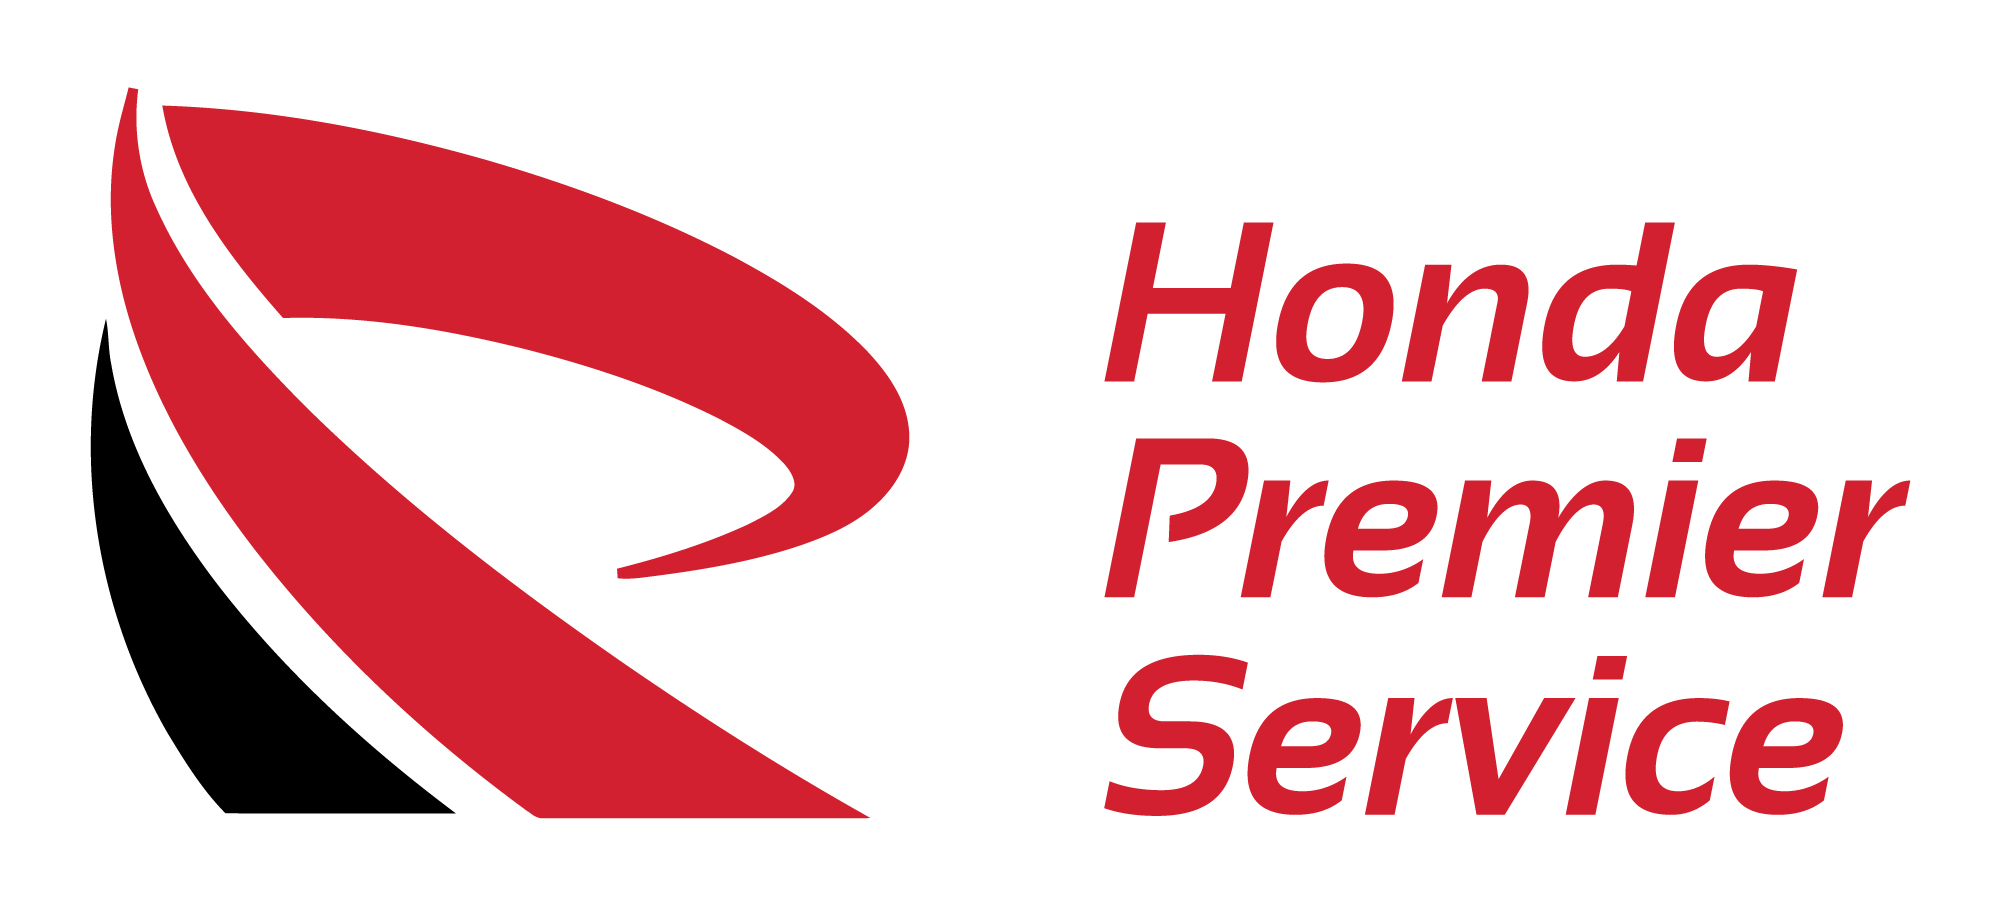 Farina's is a Honda Premier Dealership